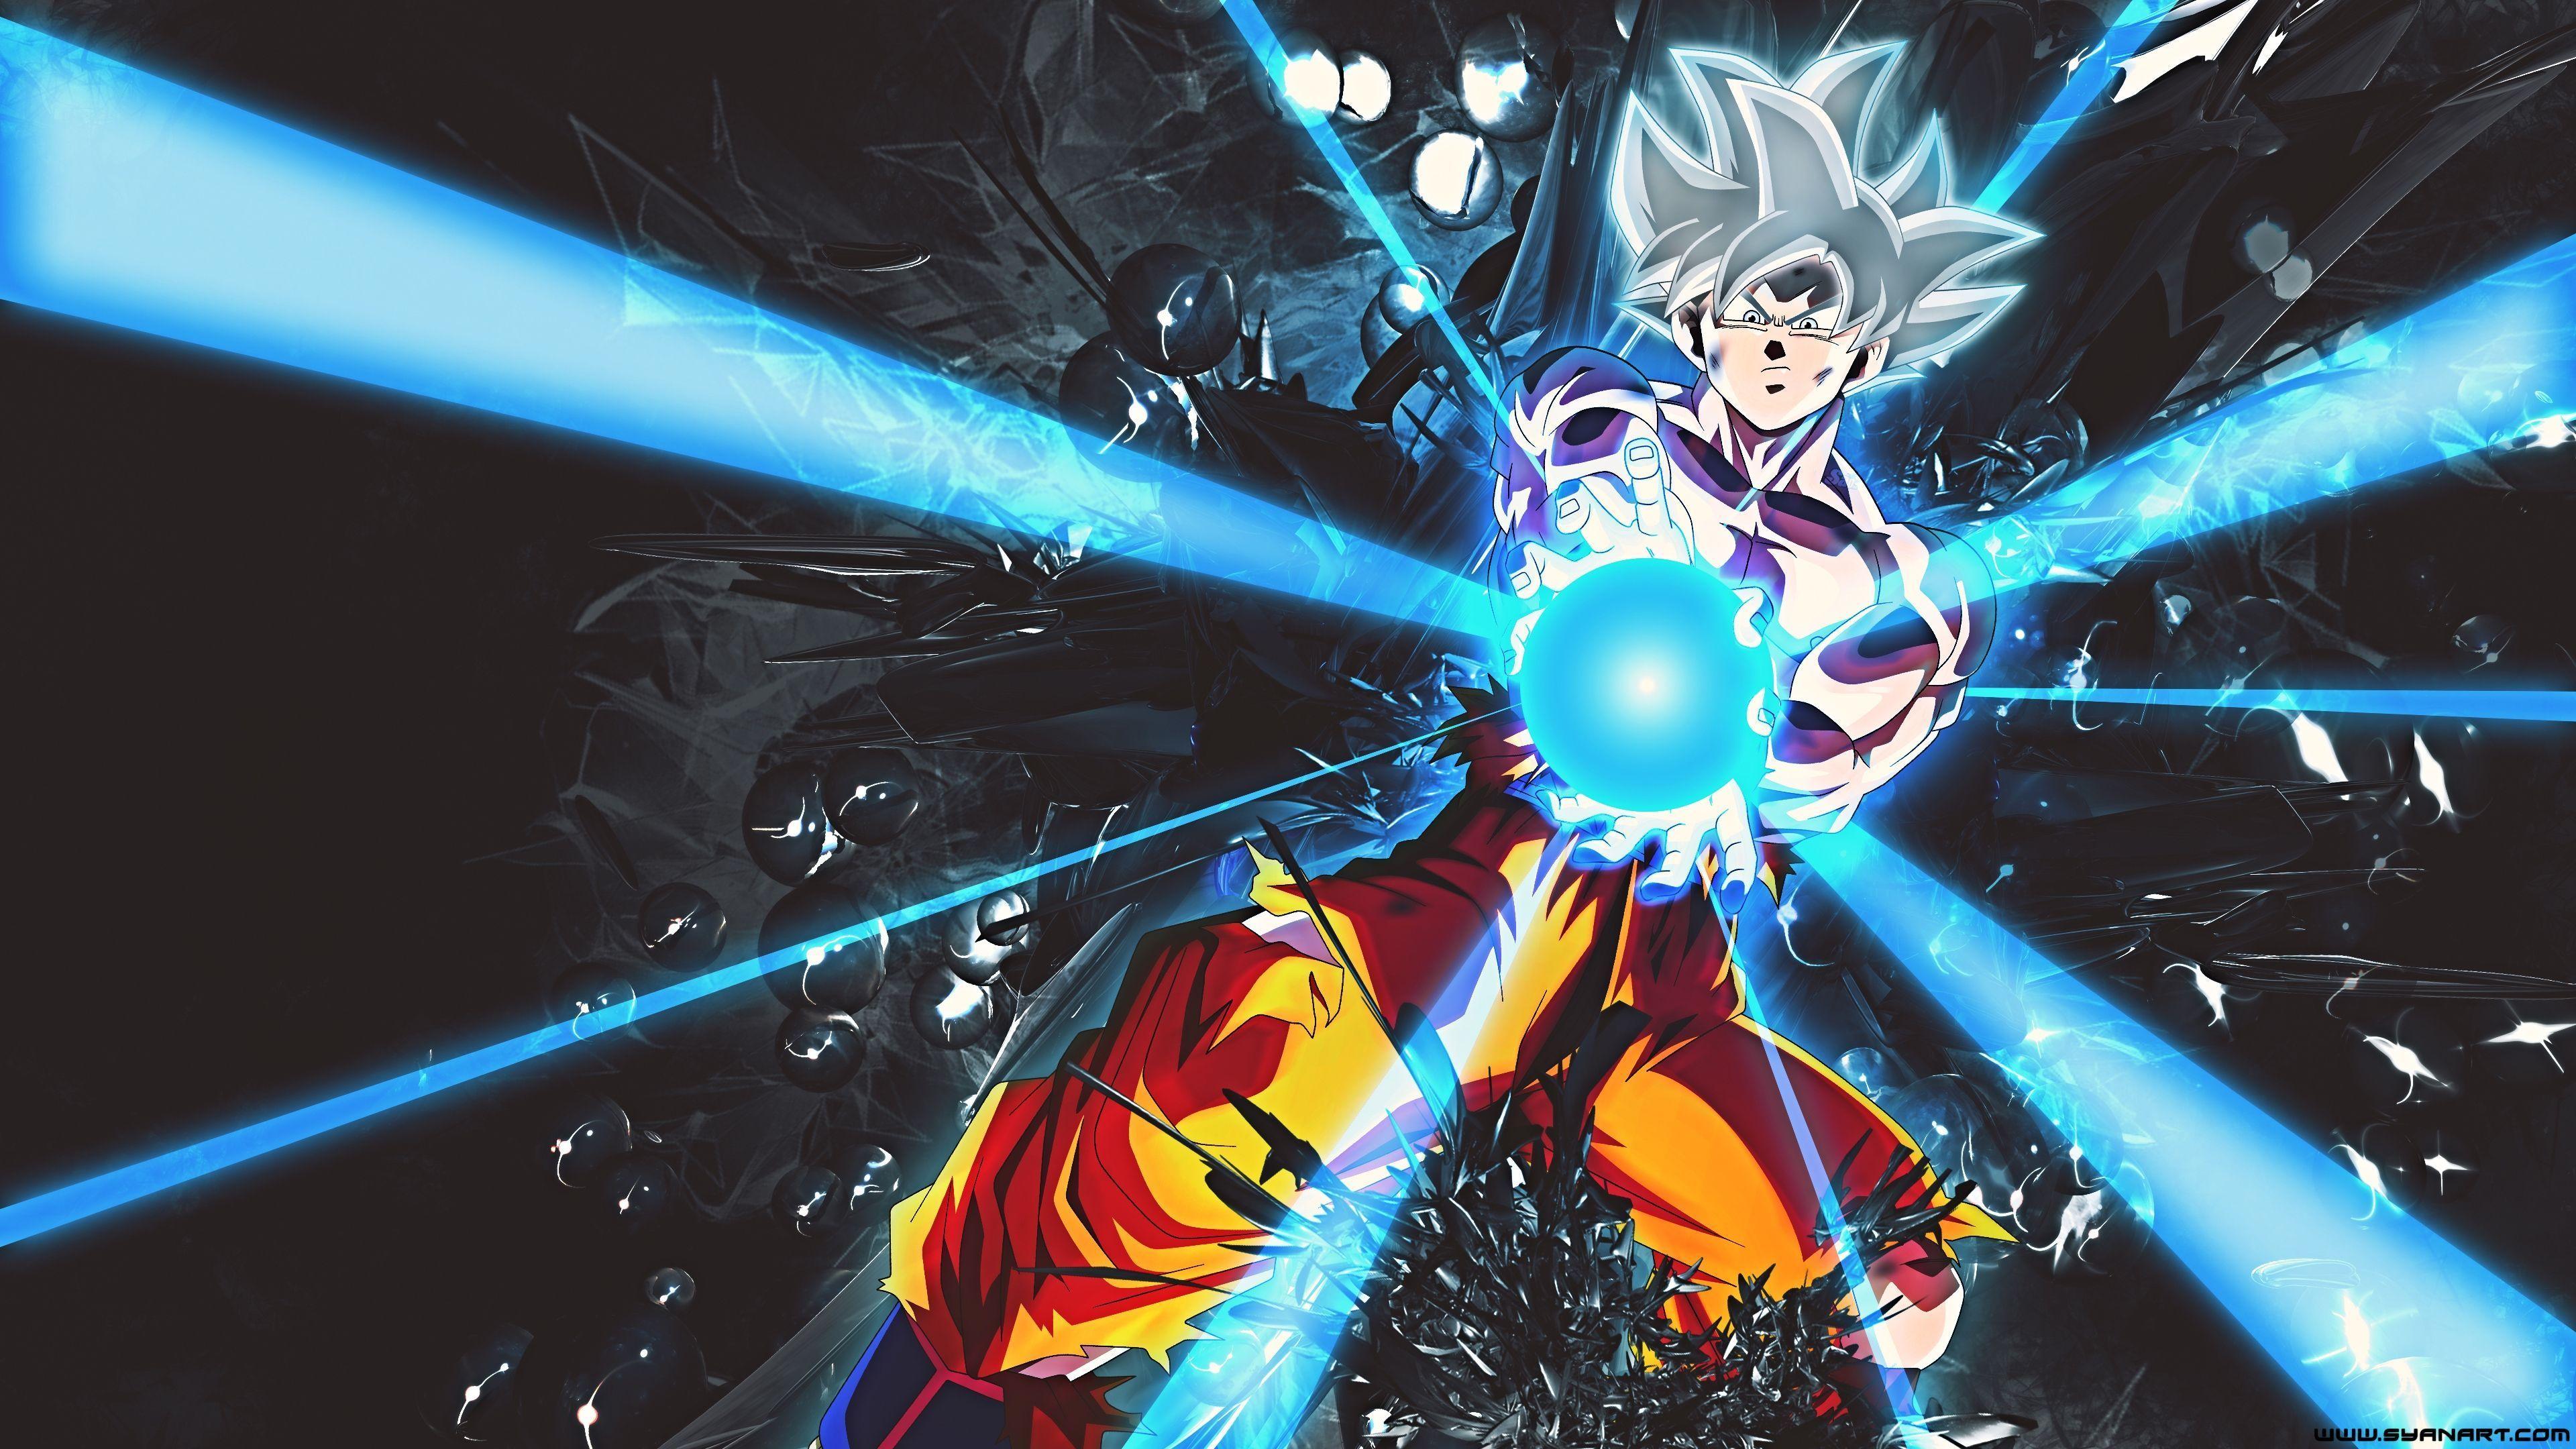 Wallpaper Ultra Instinct Goku Dragon Ball Super 4k Anime 12394anime Ultra Instin 4k Dragon Ball Art Dragon